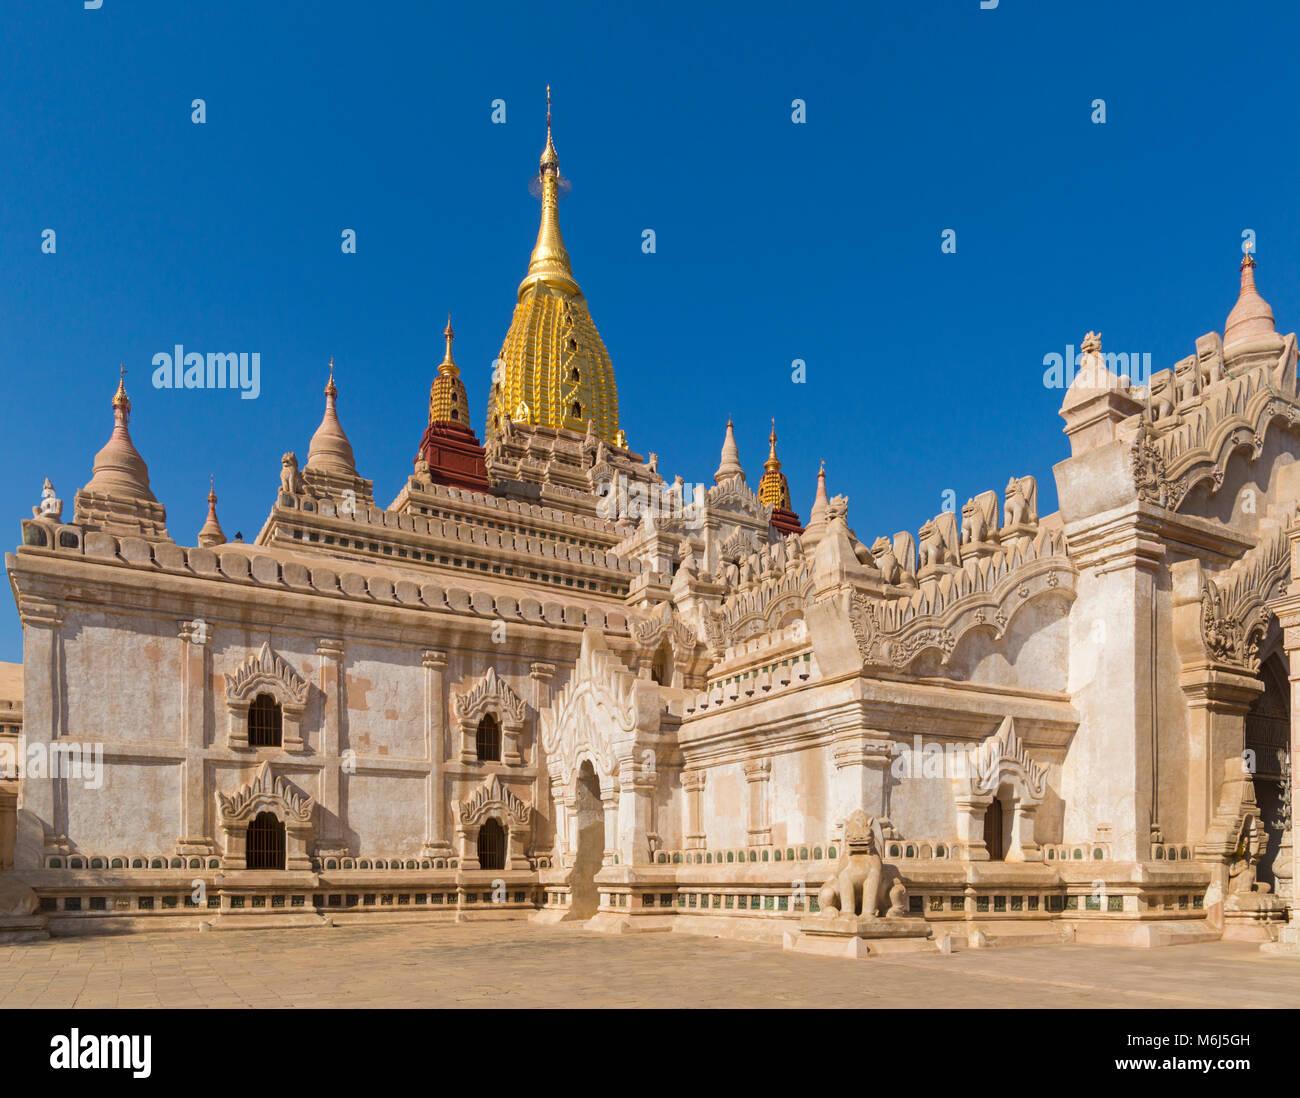 La Pagoda di Ananda, Ananda Tempio a Bagan, Myanmar (Birmania), l'Asia in febbraio Immagini Stock